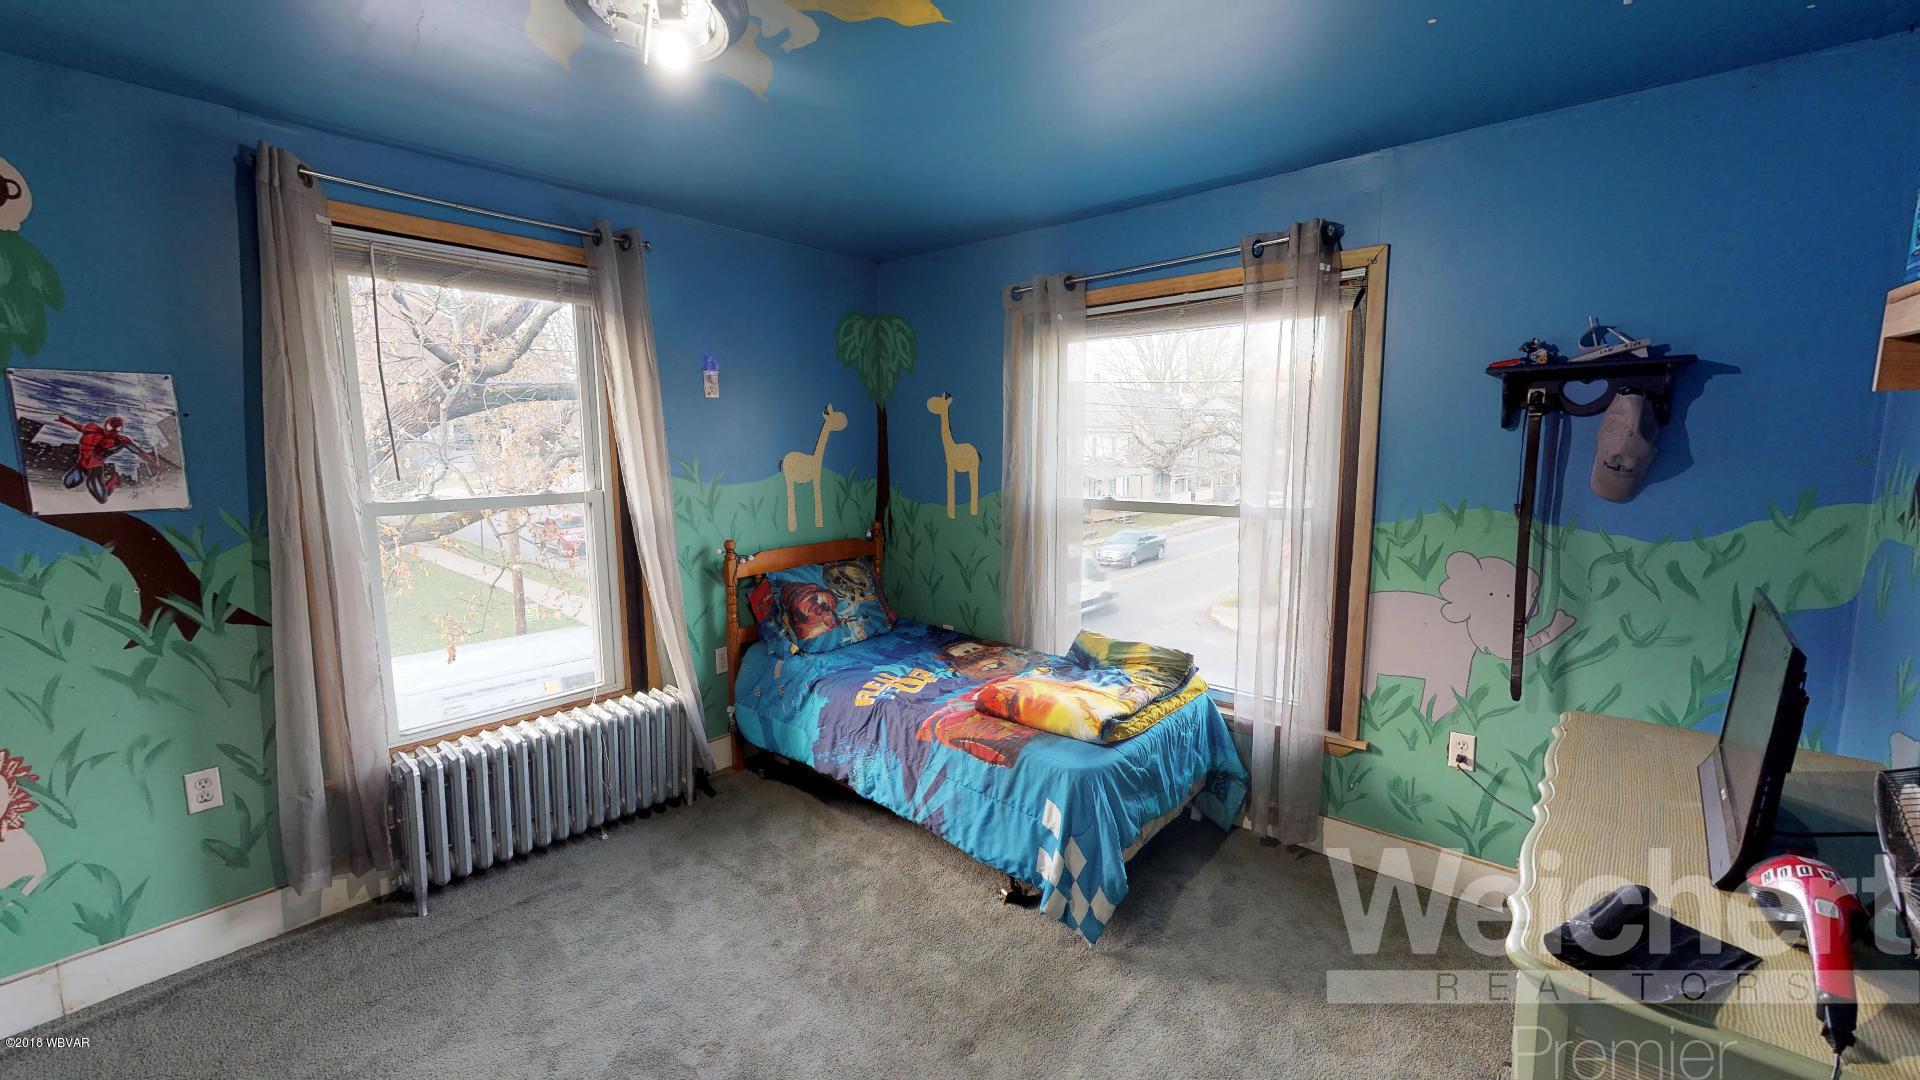 1929 MEMORIAL AVENUE,Williamsport,PA 17701,3 Bedrooms Bedrooms,2 BathroomsBathrooms,Residential,MEMORIAL,WB-86012